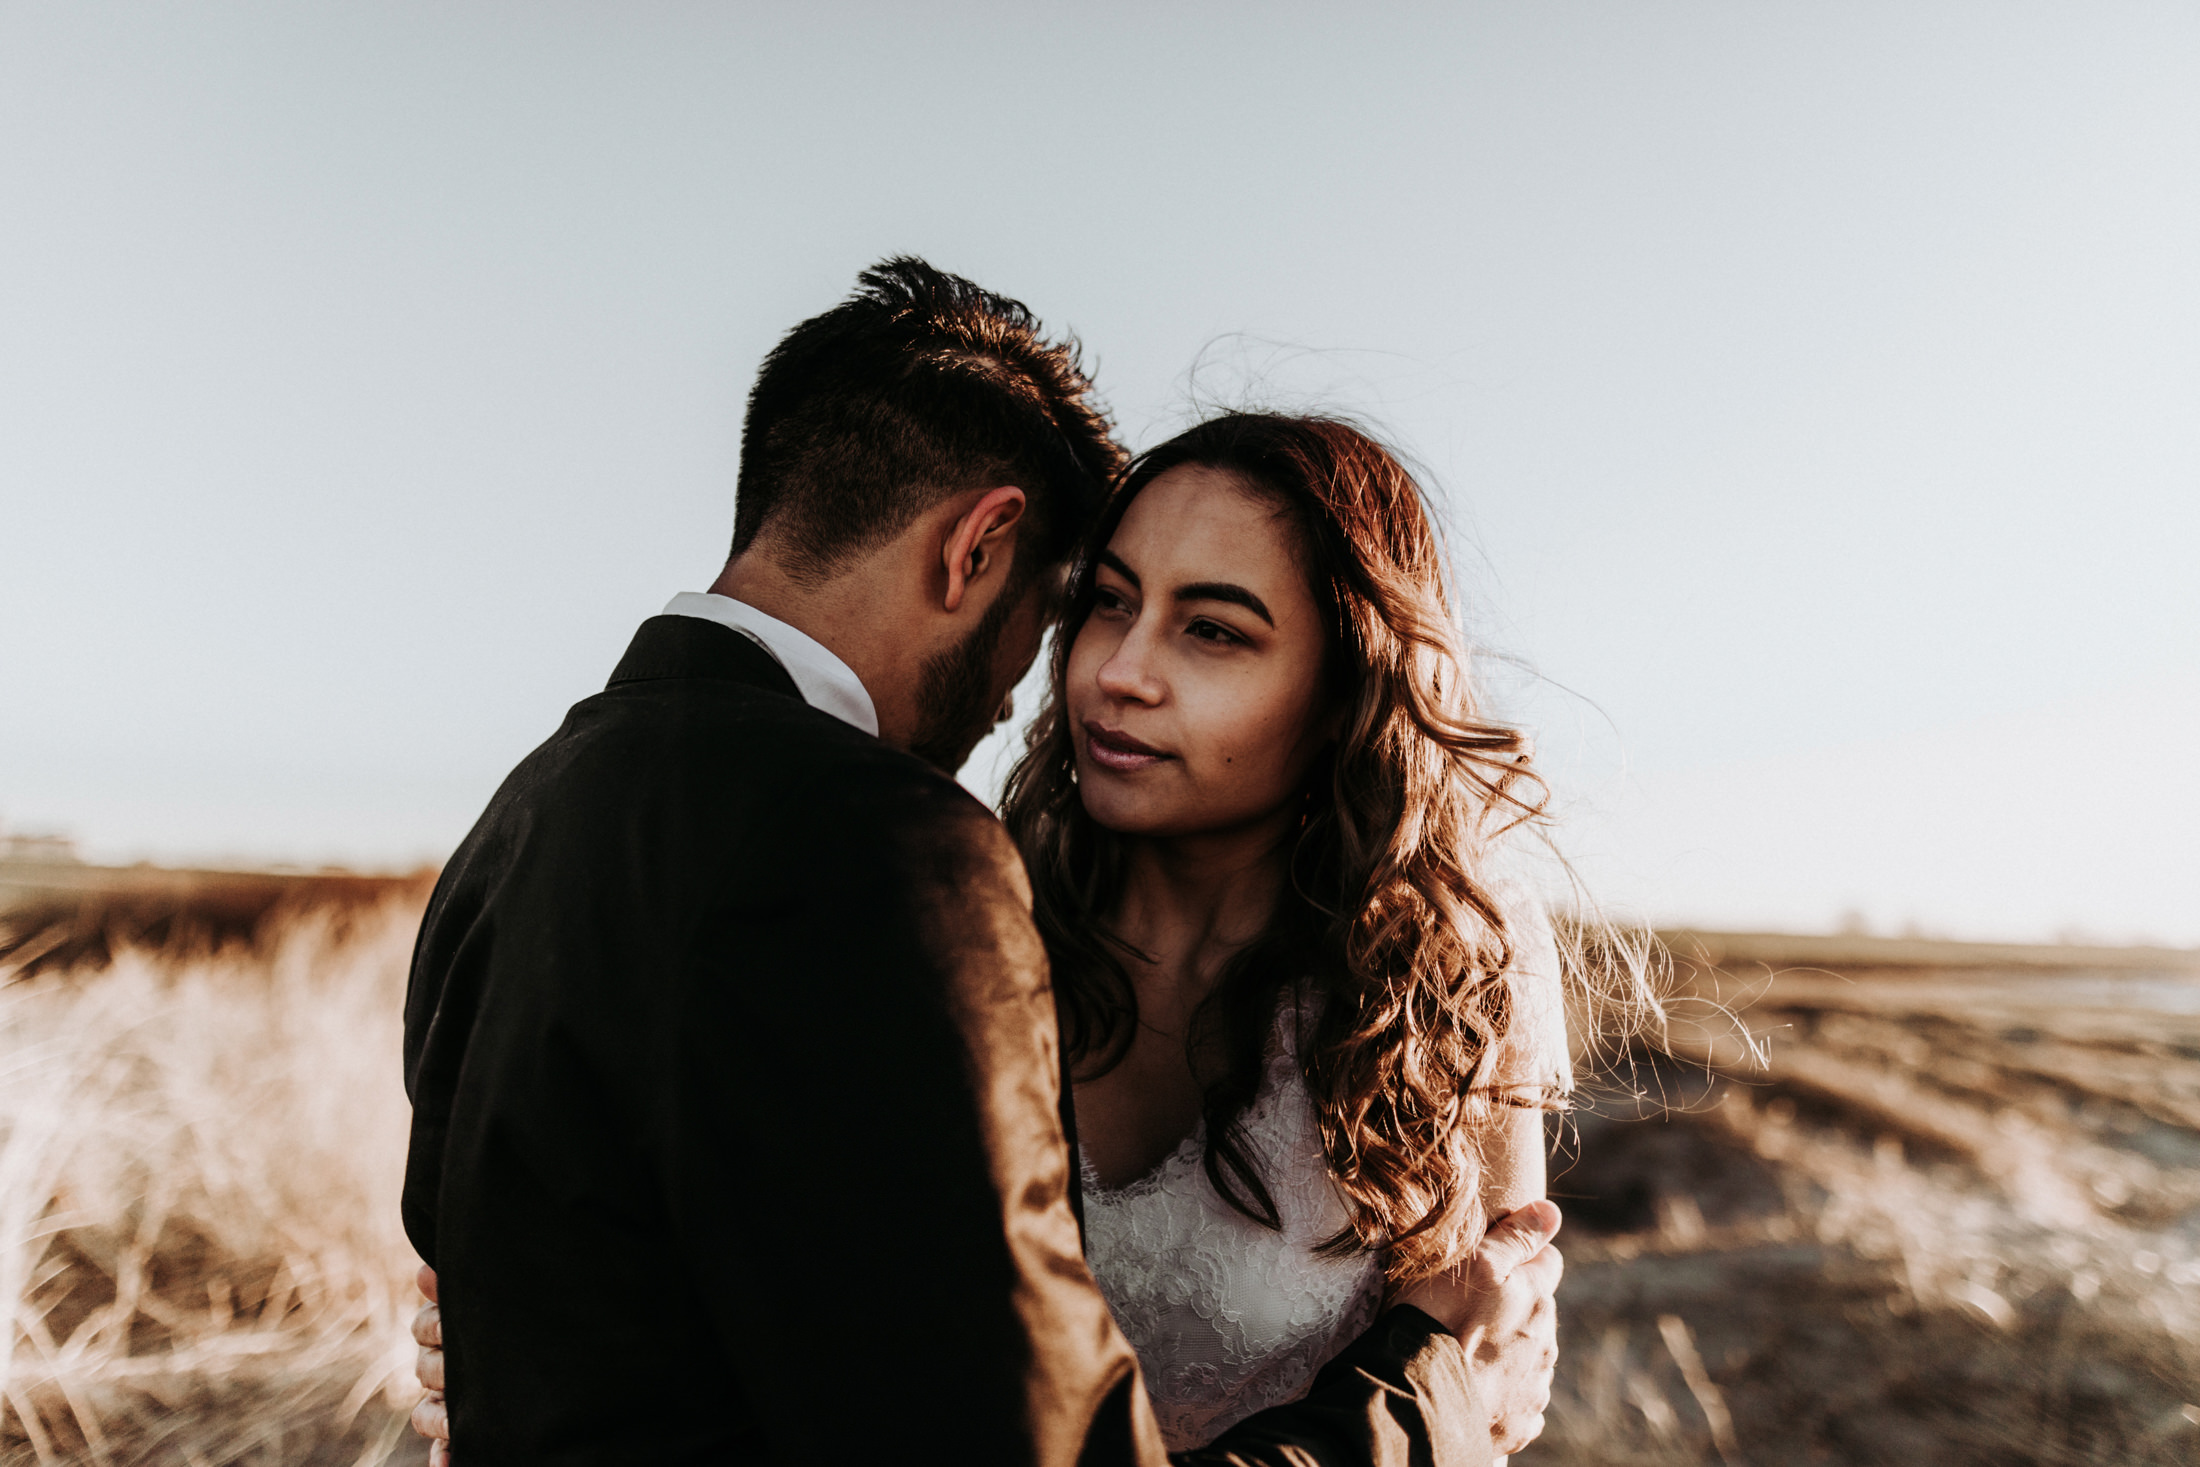 Wedding_Photographer_Mallorca_Daniela-Marquardt_Photography_CanaryIslands_Lanzarote_Iceland_Tuskany_Santorini_Portugal_Schweiz_Austria_Bayern_Elopement_Hochzeitsfotograf_Norddeichich_43